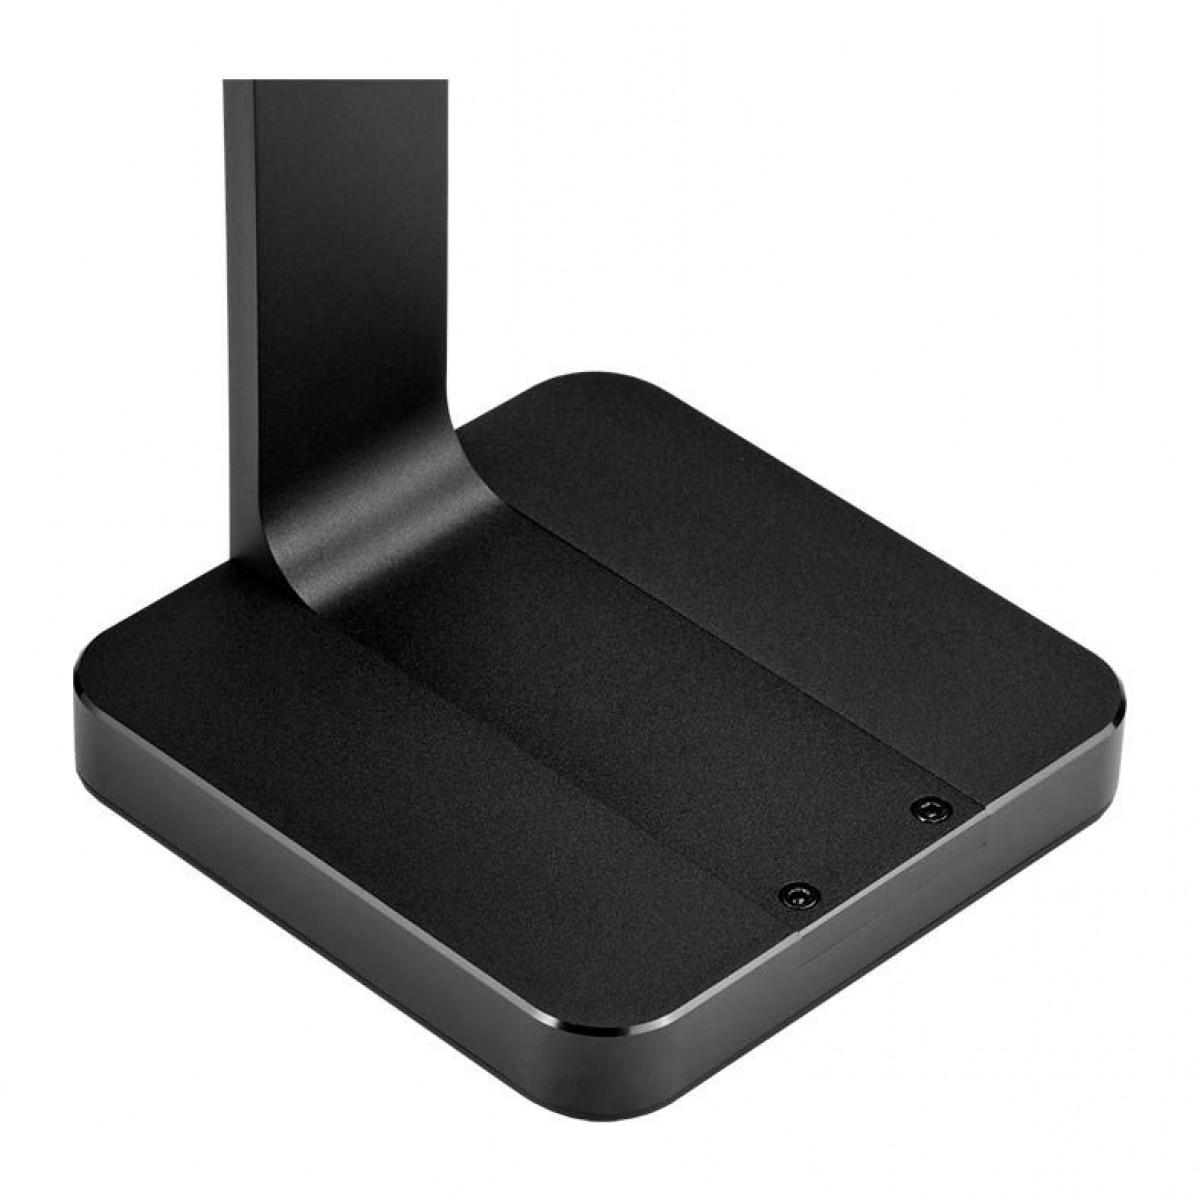 Suporte para Headset Corsair ST50 Premium, Black, CA-9011221-NA